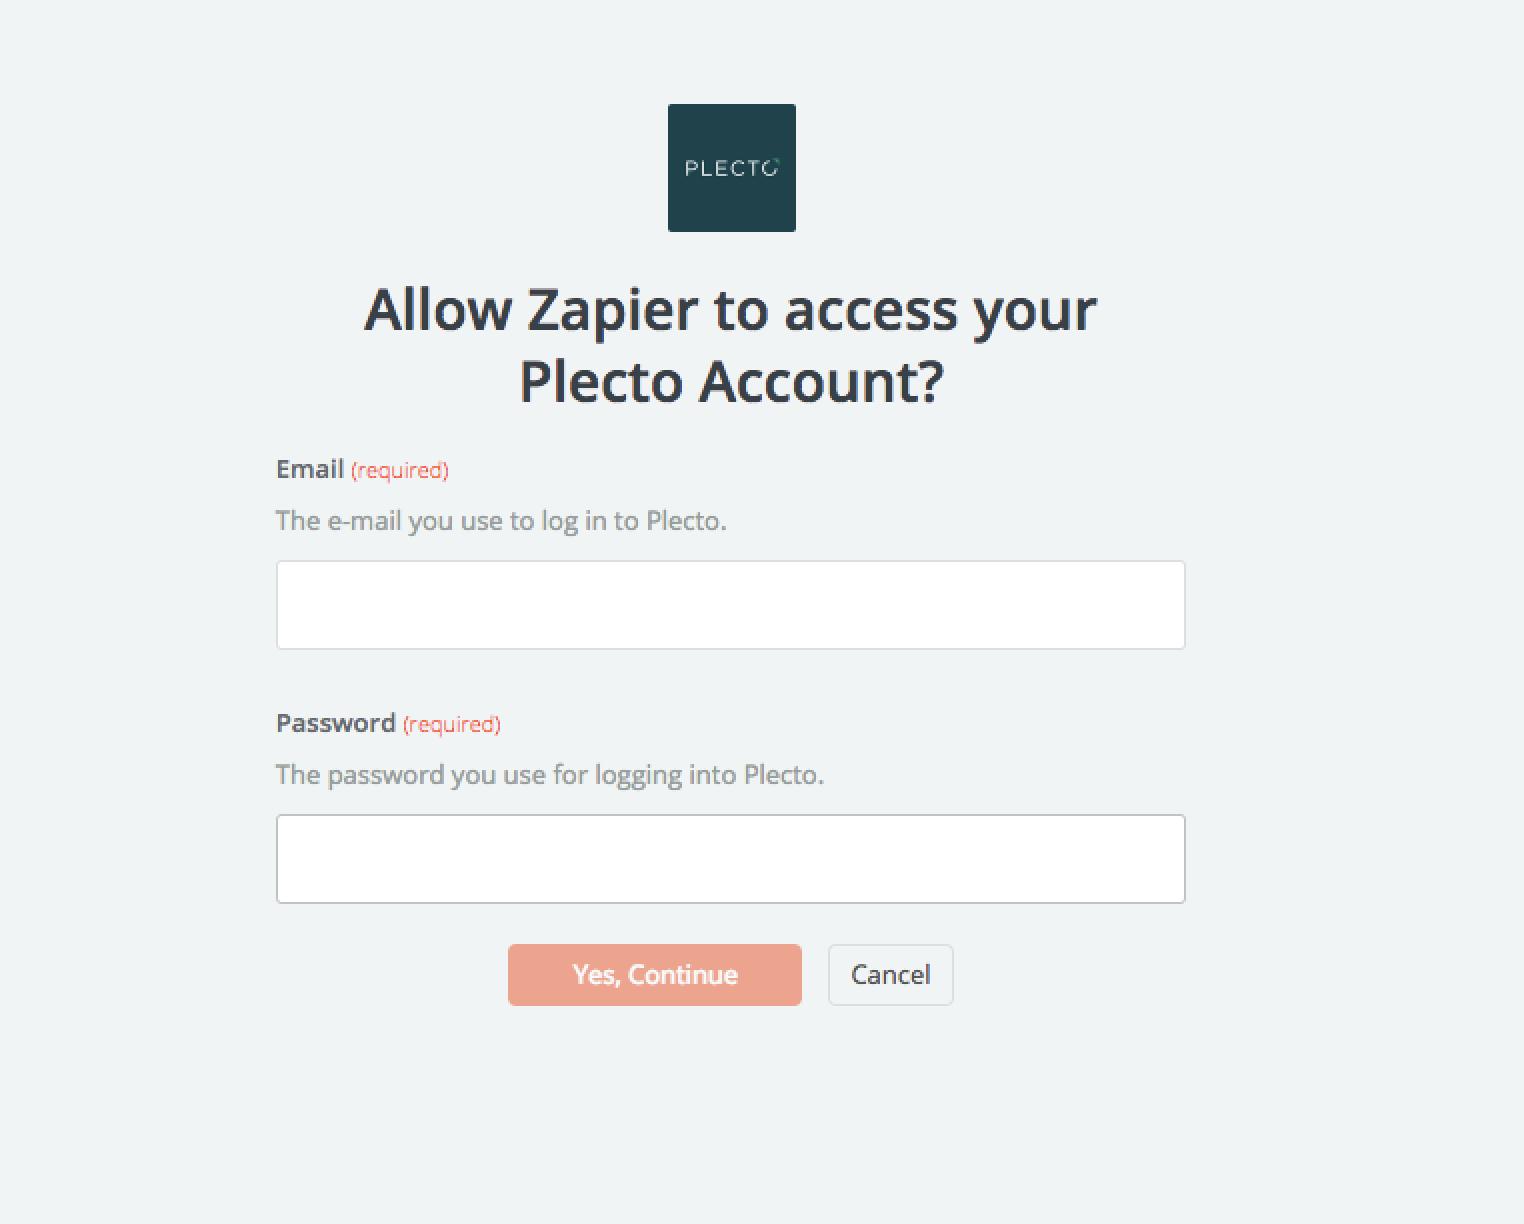 Plecto username and password